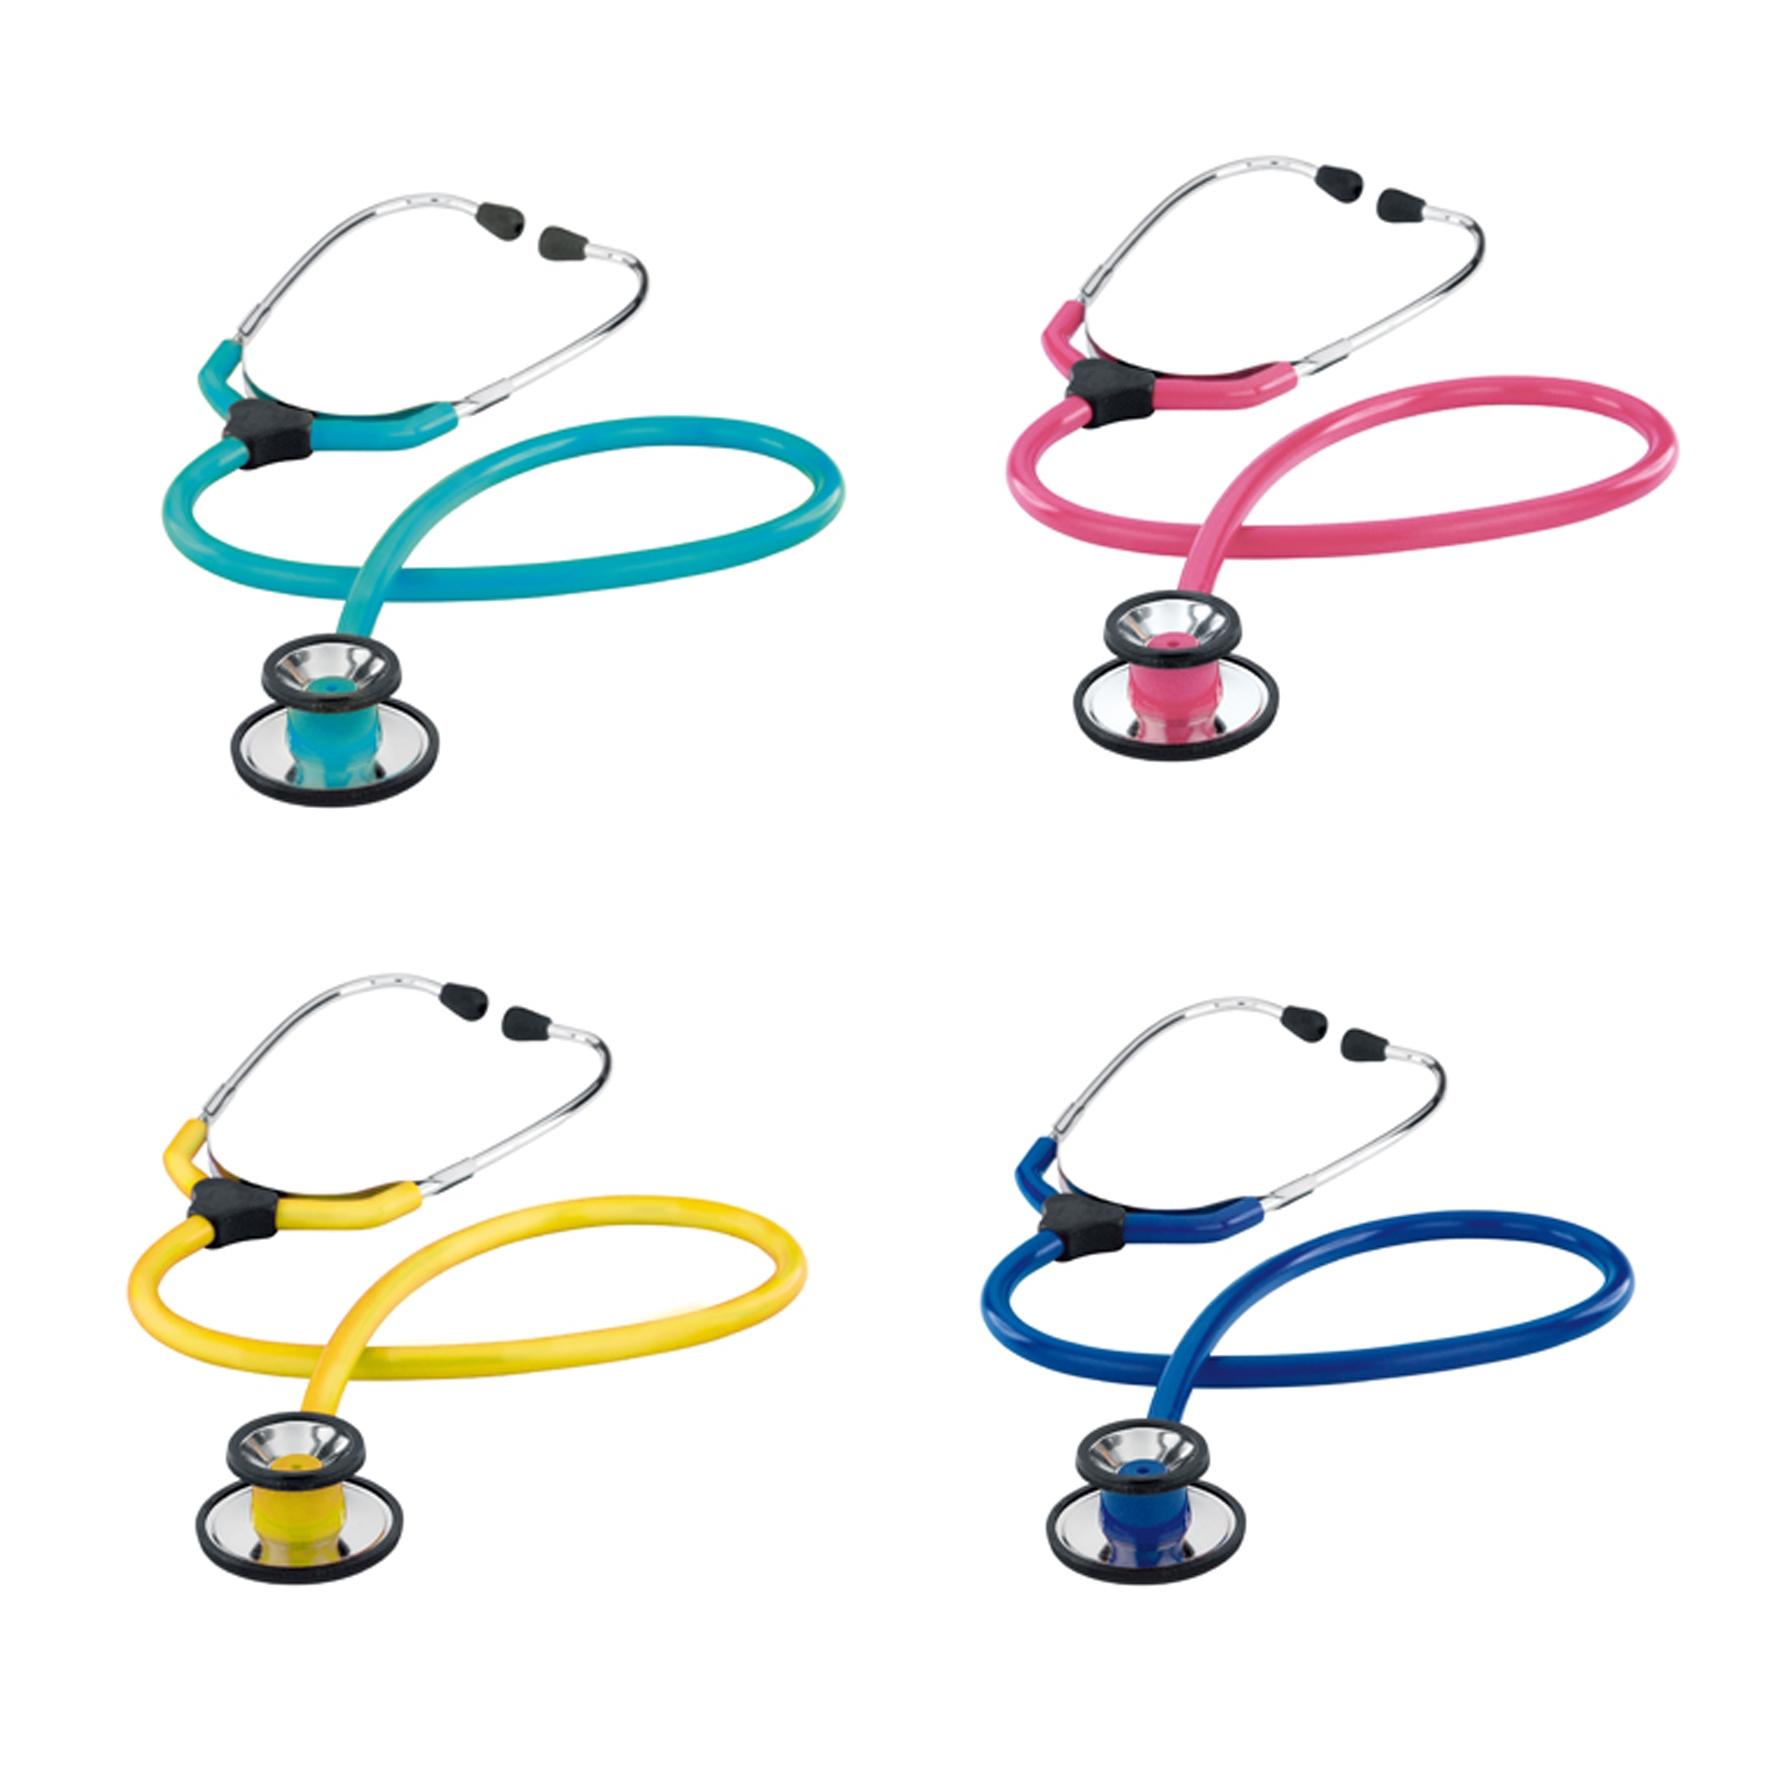 Colorscop stethoscopen